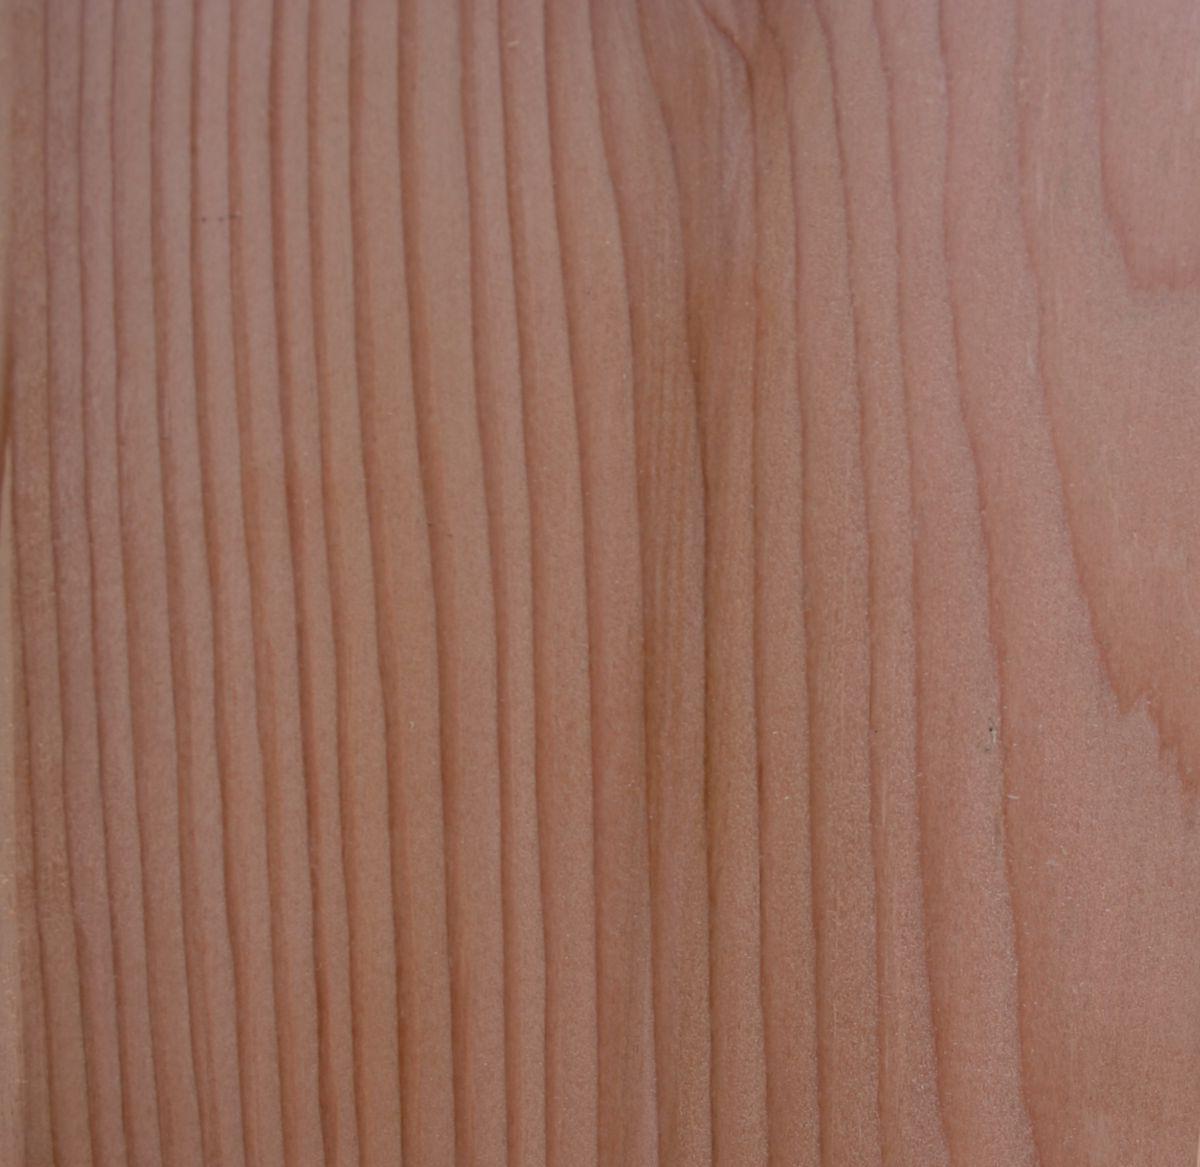 Bardage Clin Natural Red Cedar Profil St Louis Rain Bouvet En